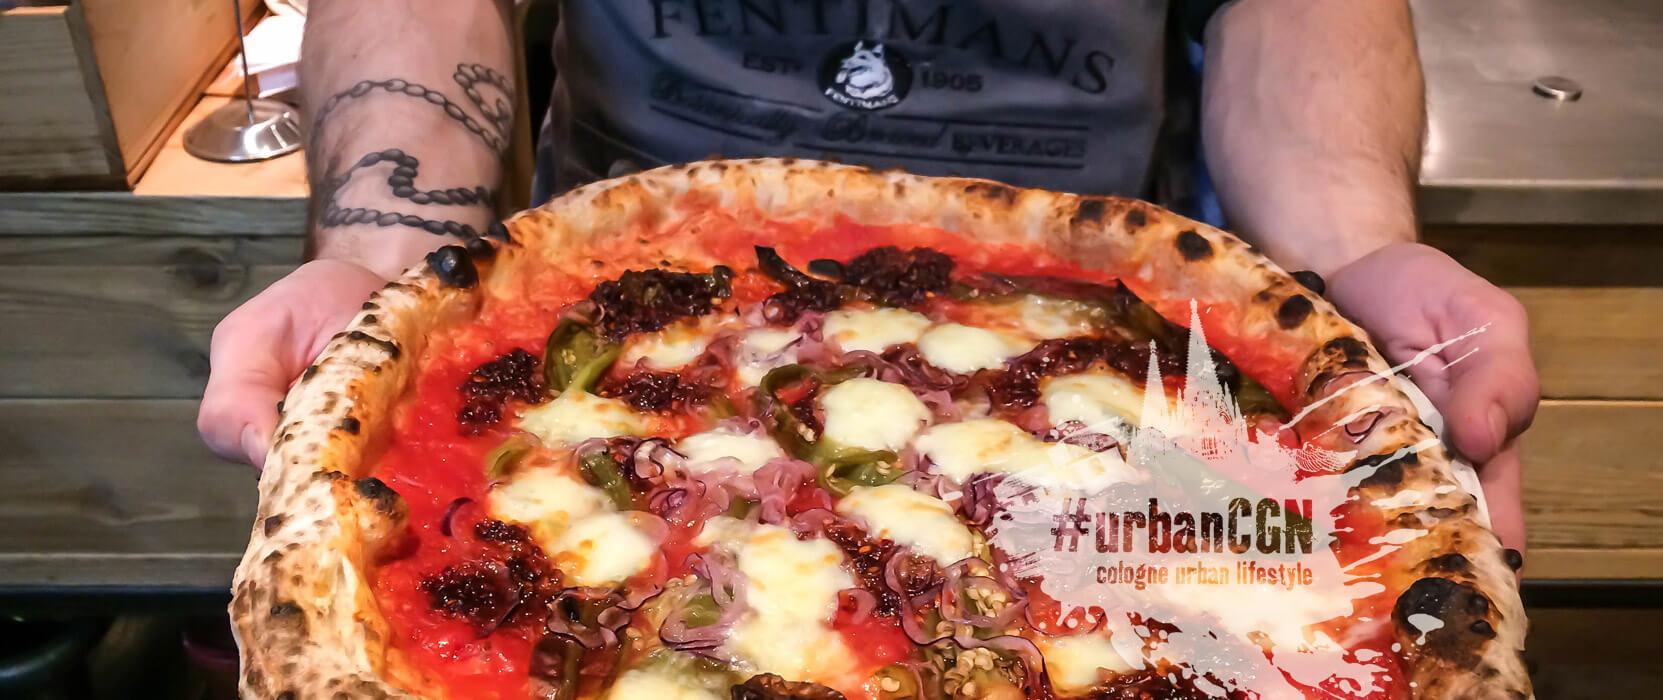 485°, fertige Pizza